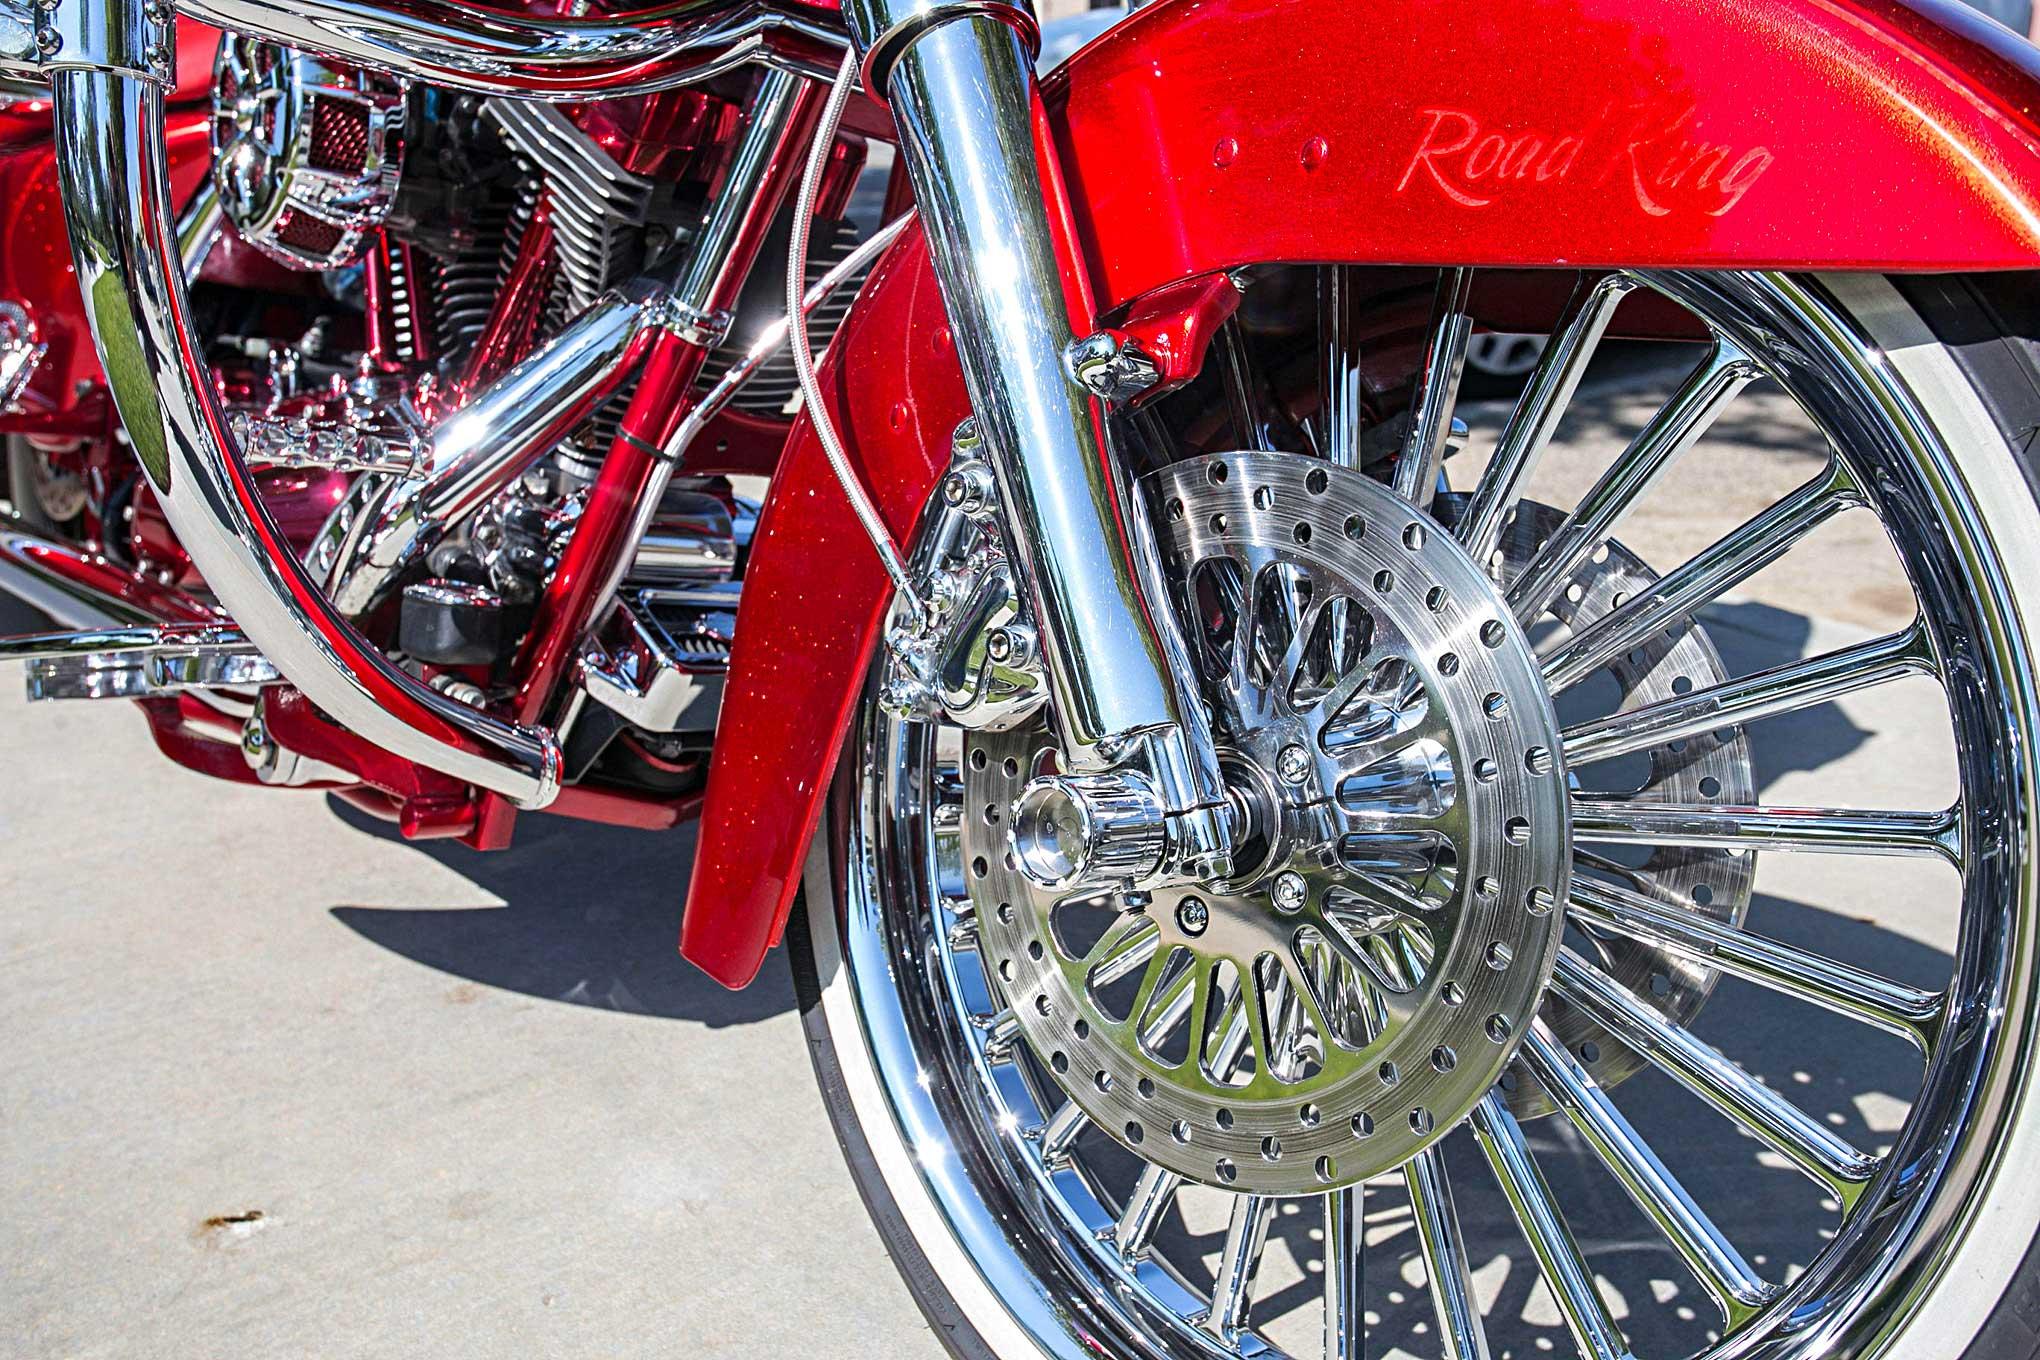 Avon Motorcycle Tires >> Serafin Romero's 2005 Harley-Davidson Road King